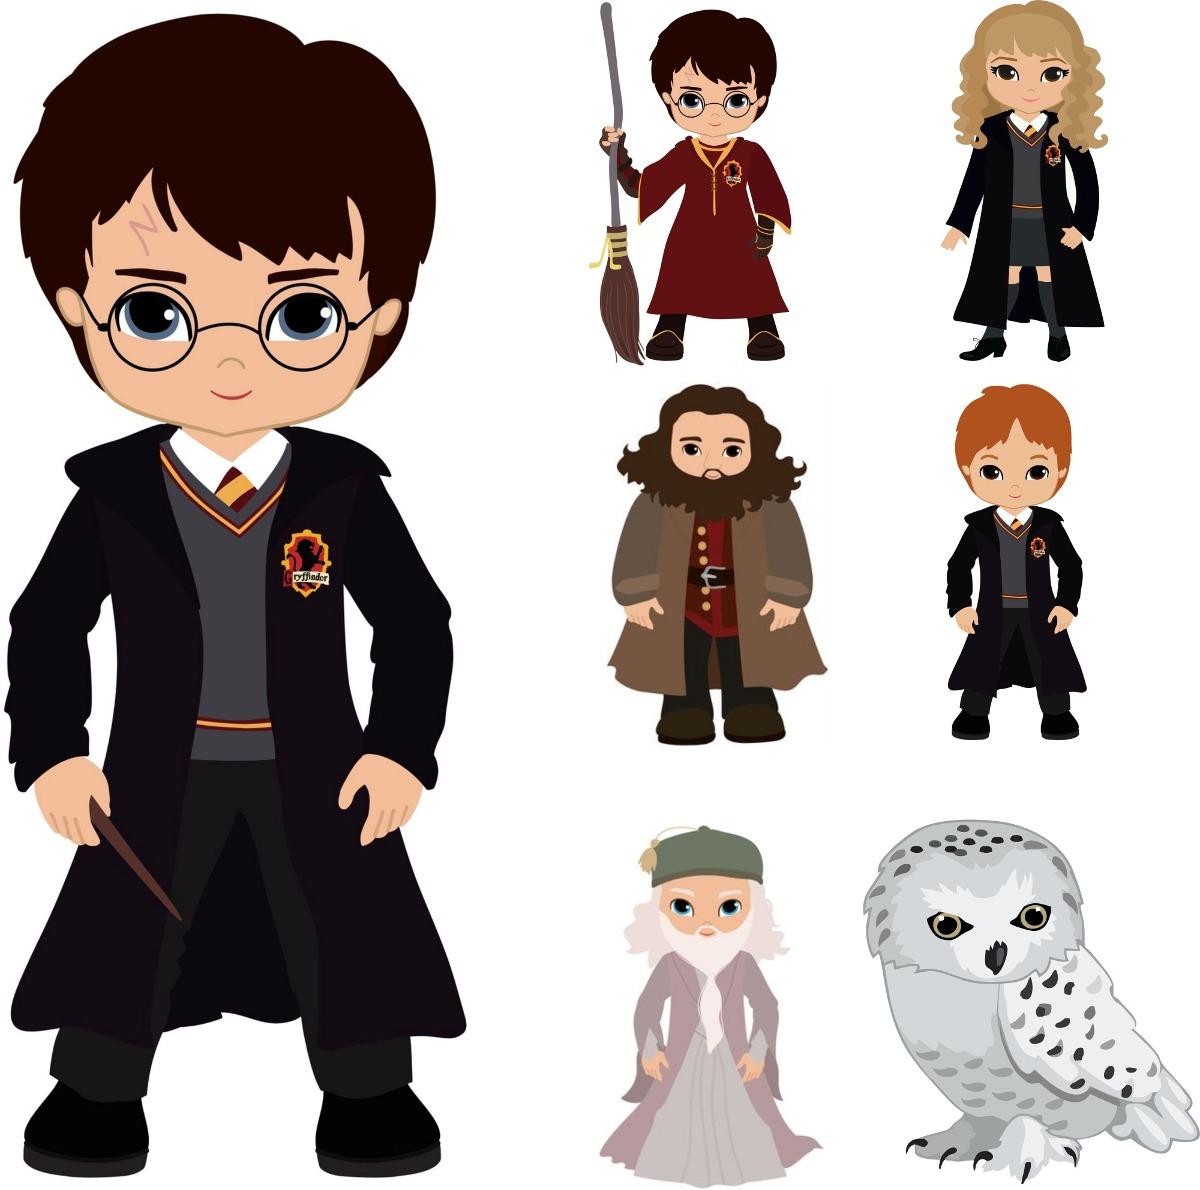 Kit 7 Peças Displays Chão E Mesa Harry Potter Cute